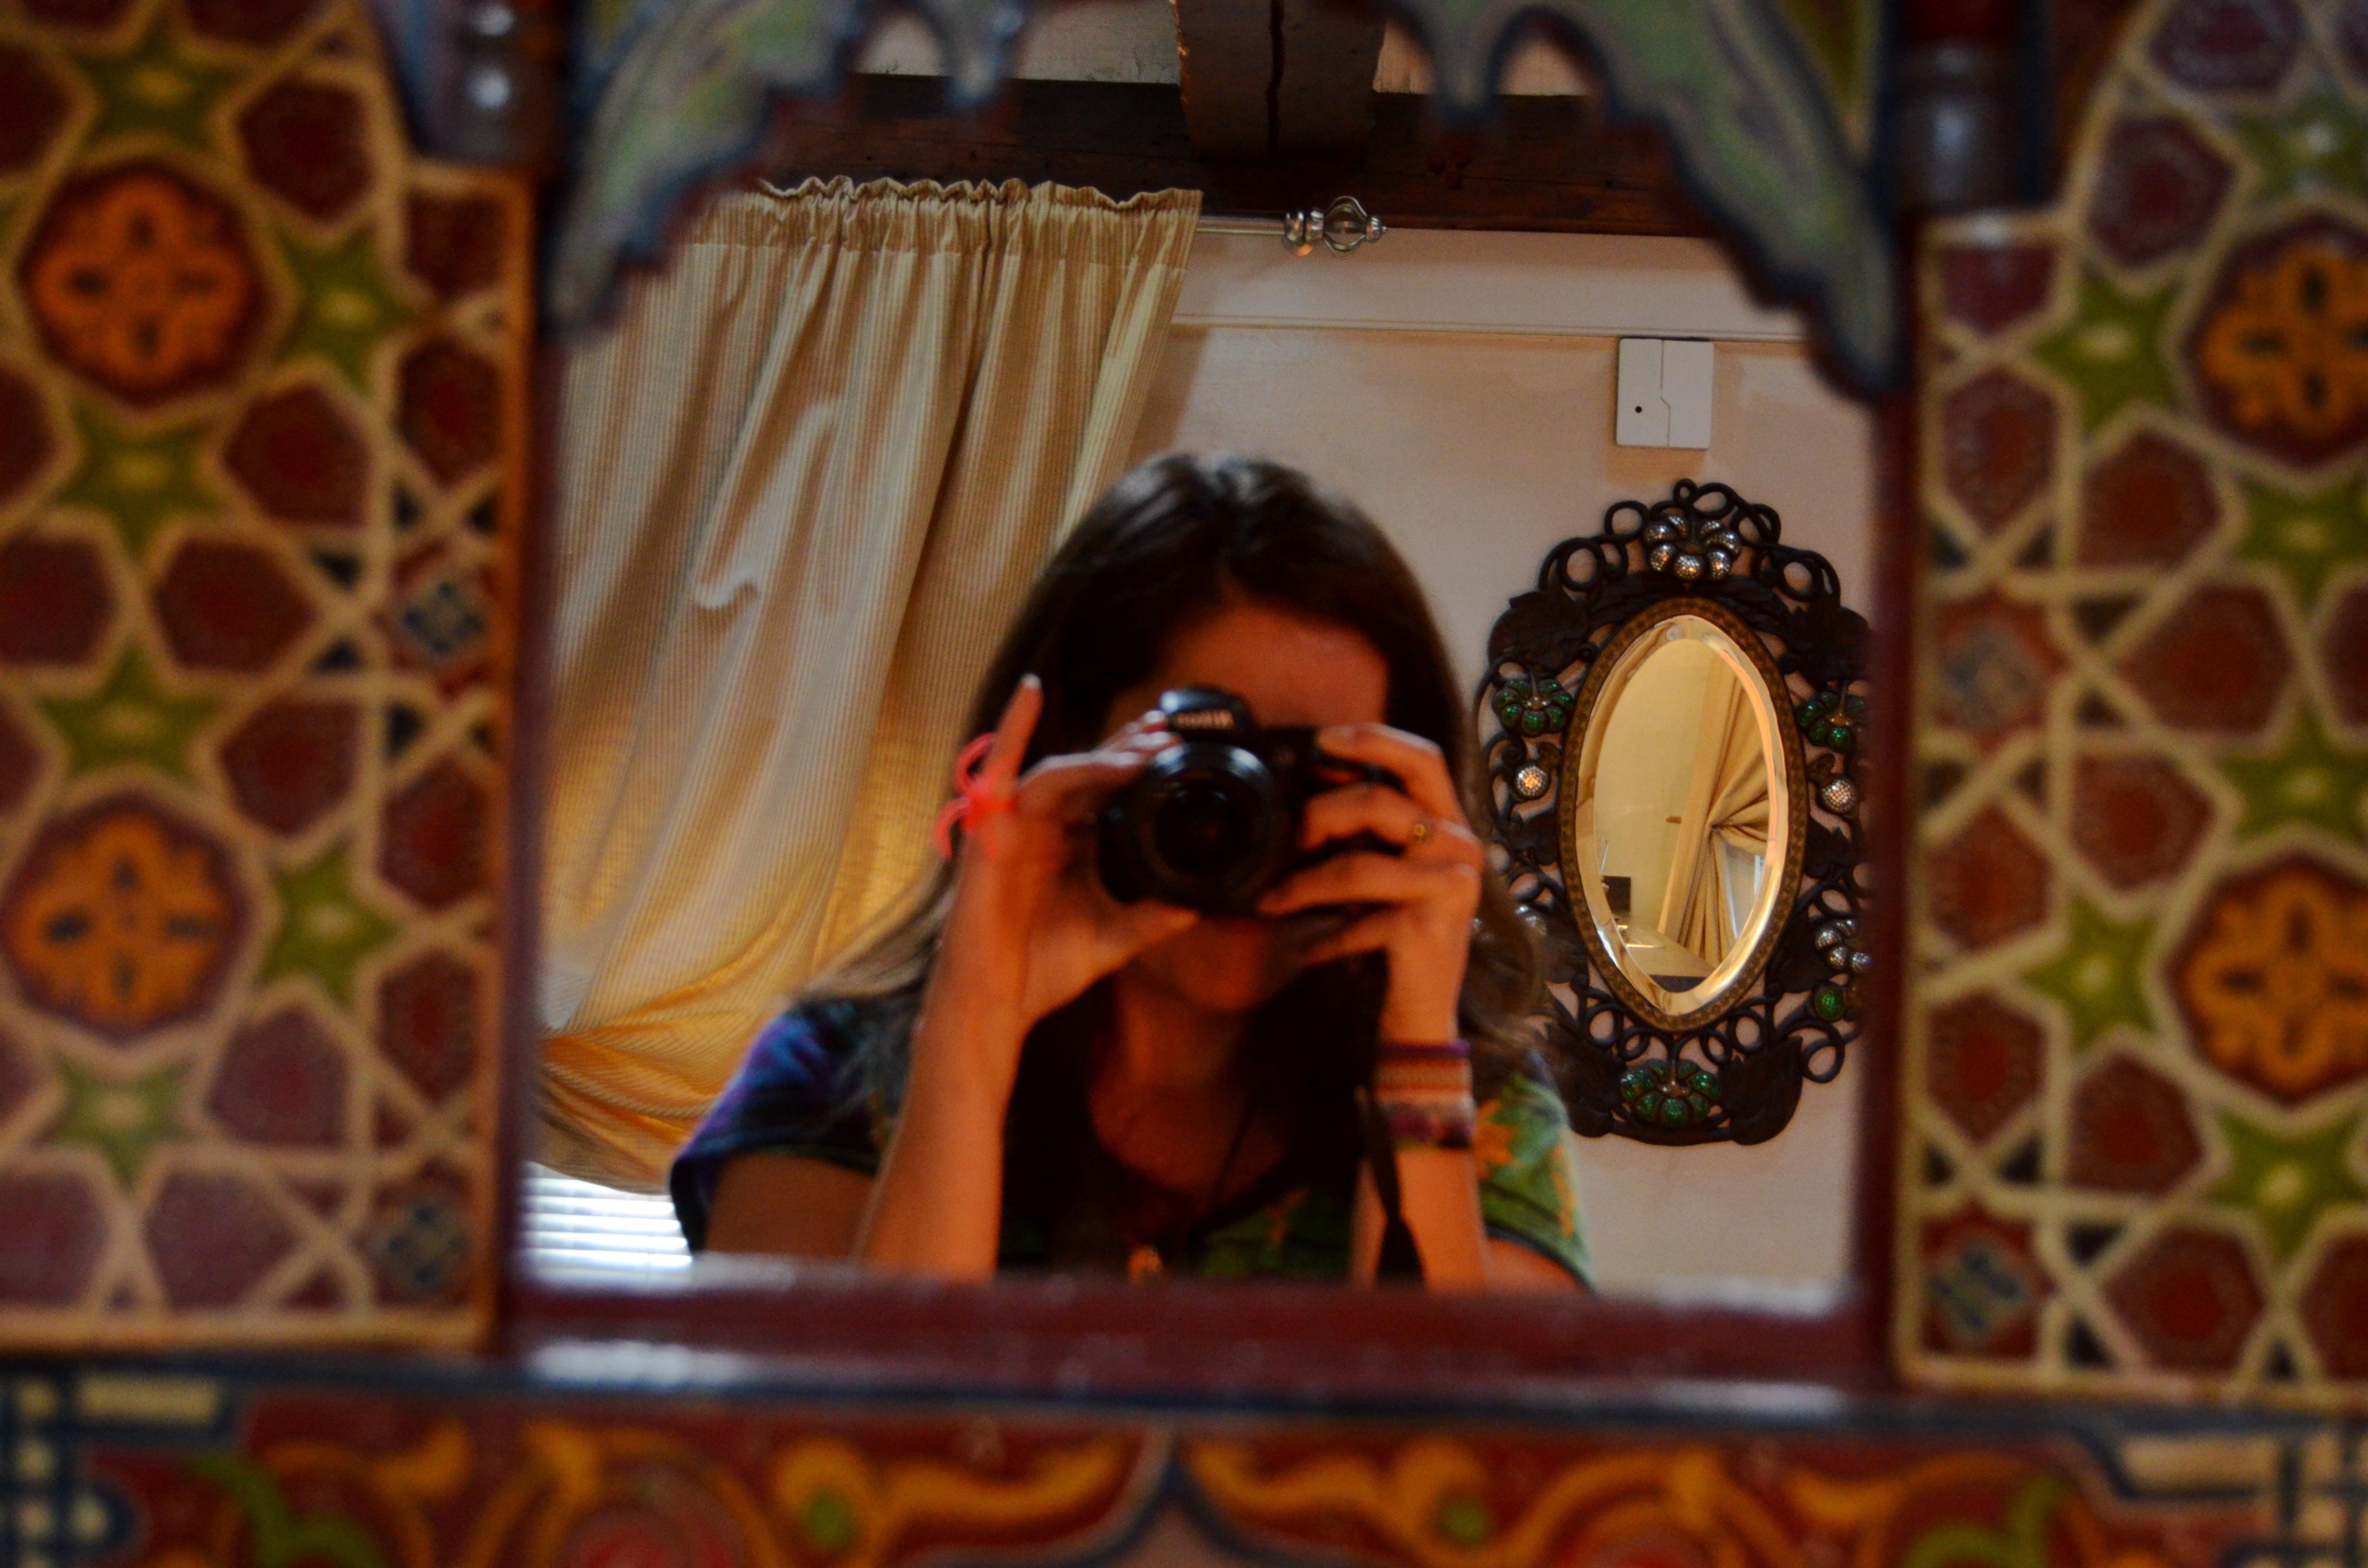 Moroccan mirrors